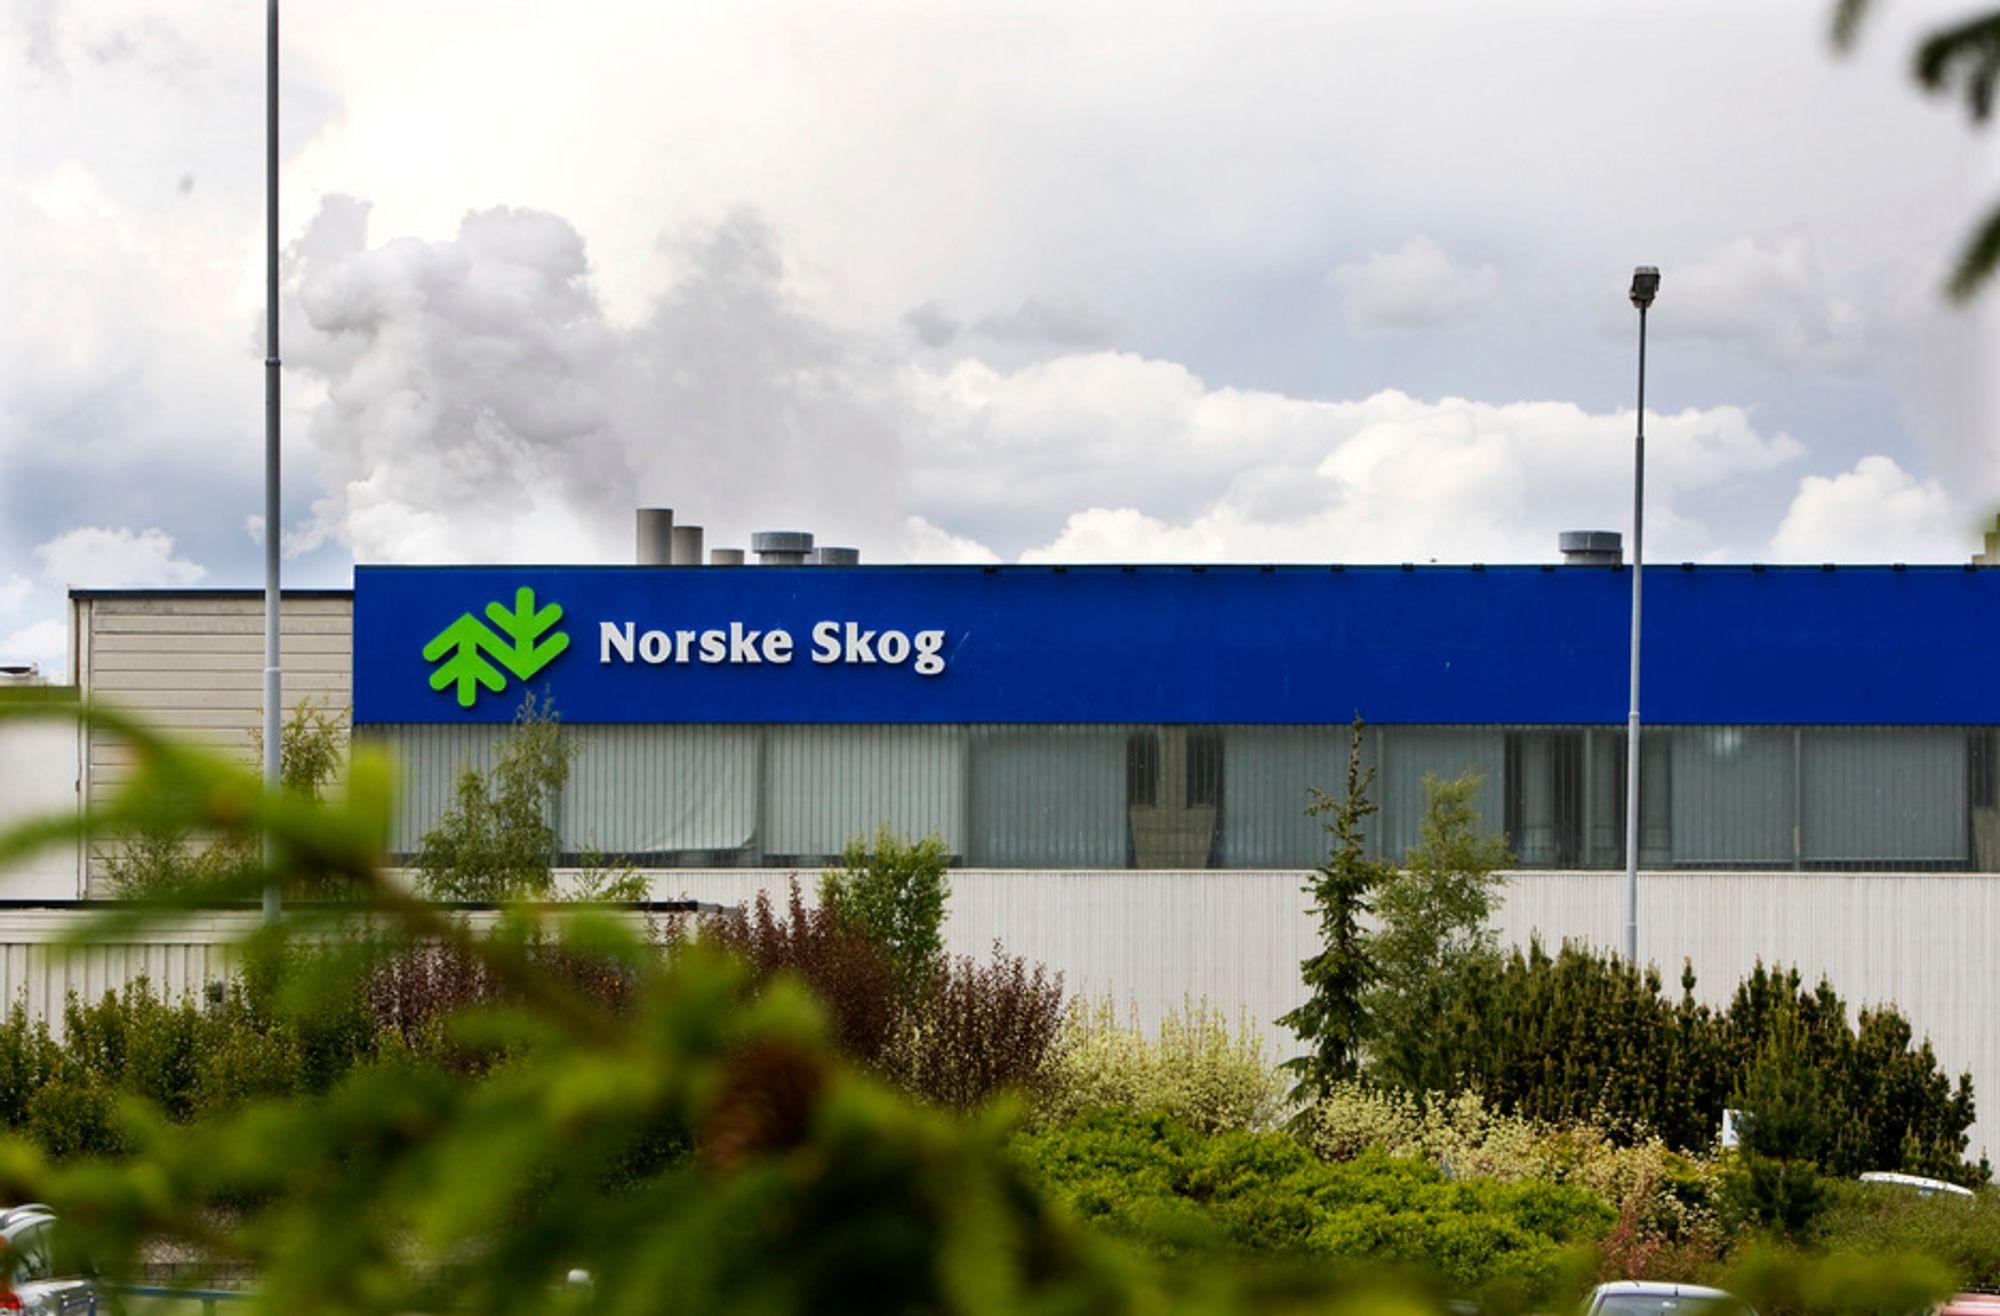 UTFORDRENDE: Resultatet før skatt endte på minus 1.176 millioner kroner. Norske Skog beskriver markedet videre som utfordrende.